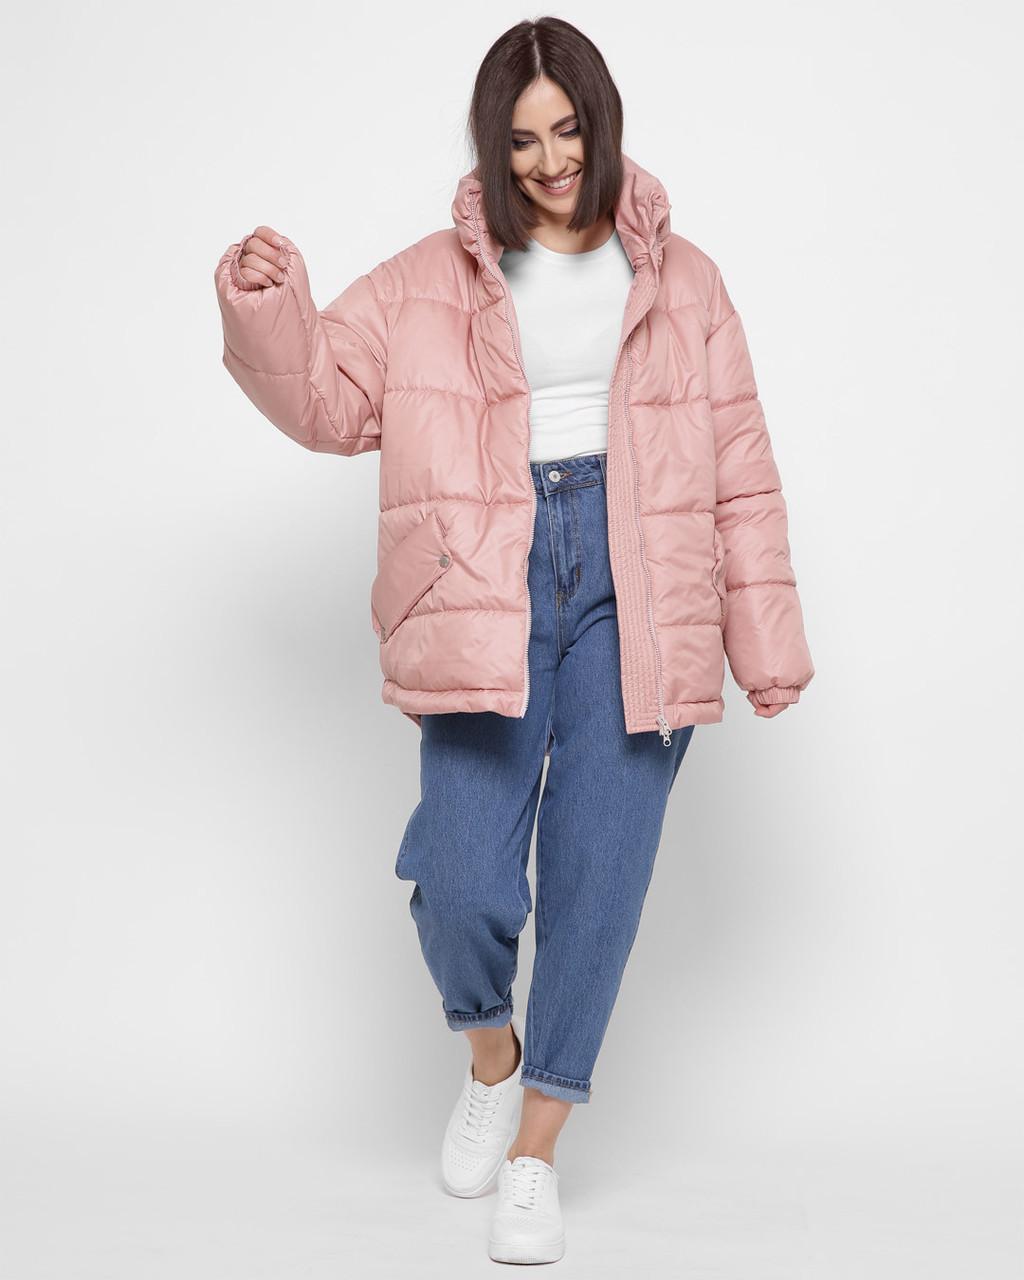 Женская пудровая демисезонная куртка оверсайз X-Woyz